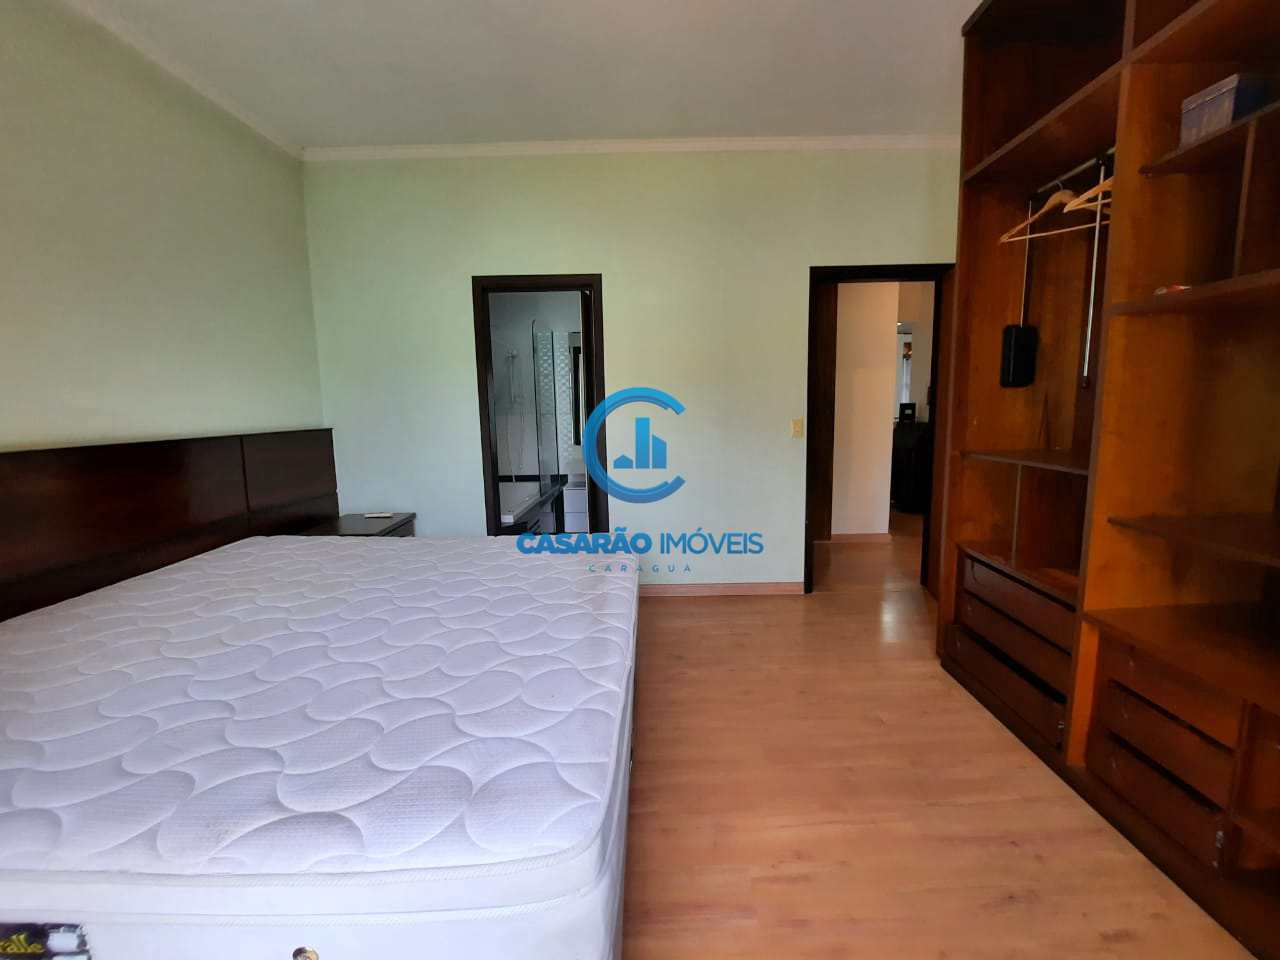 Casa com 4 dorms, Jardim Britânia, Caraguatatuba - R$ 1.35 mi, Cod: 9222